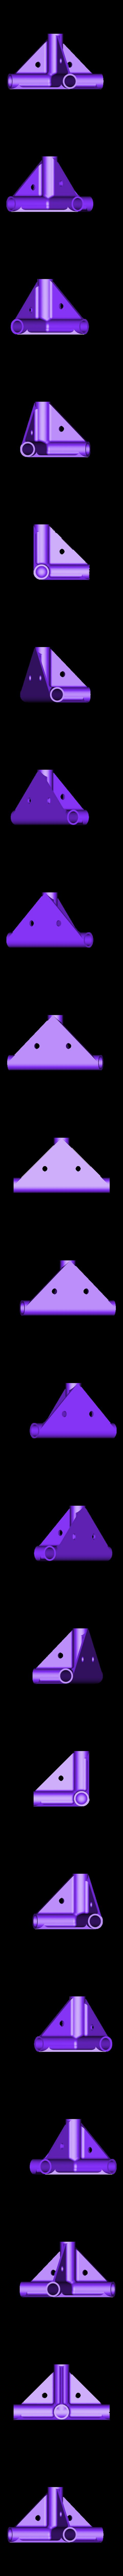 raccord droit 4 tubes 90 5toiles.stl Download free STL file Pipe brackets dia 12 • 3D printing model, mk25